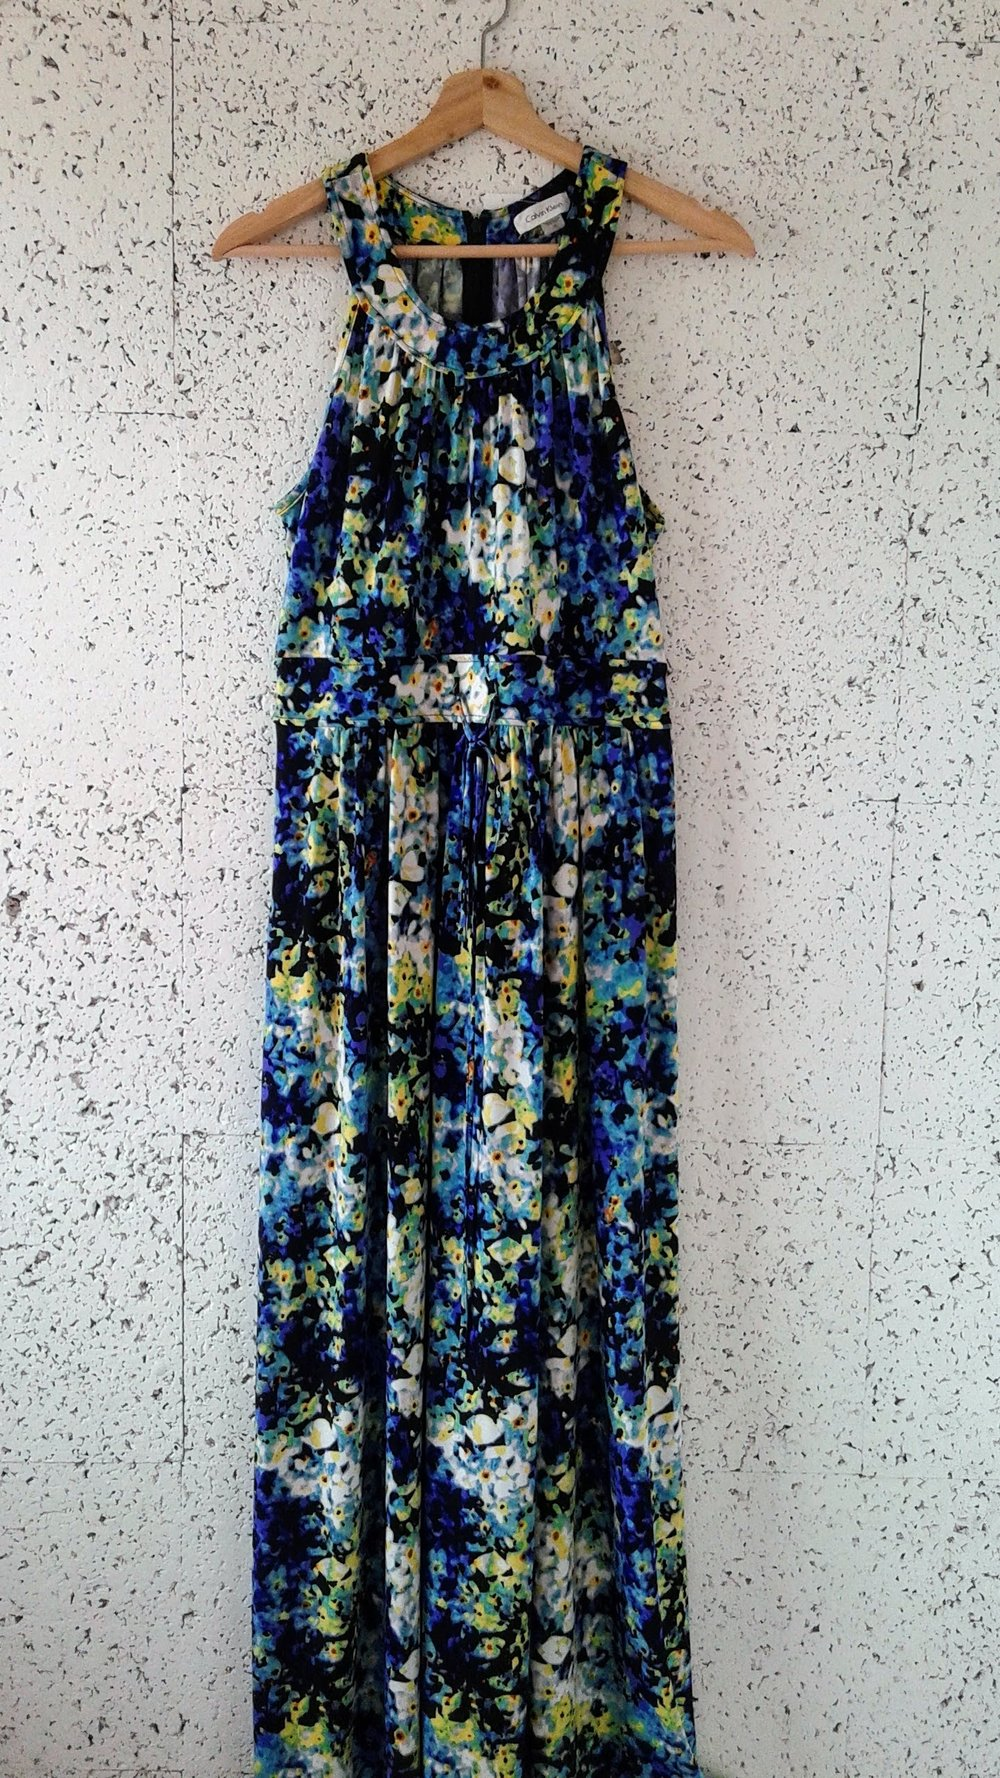 Calvin Klein dress; Size 12, $42